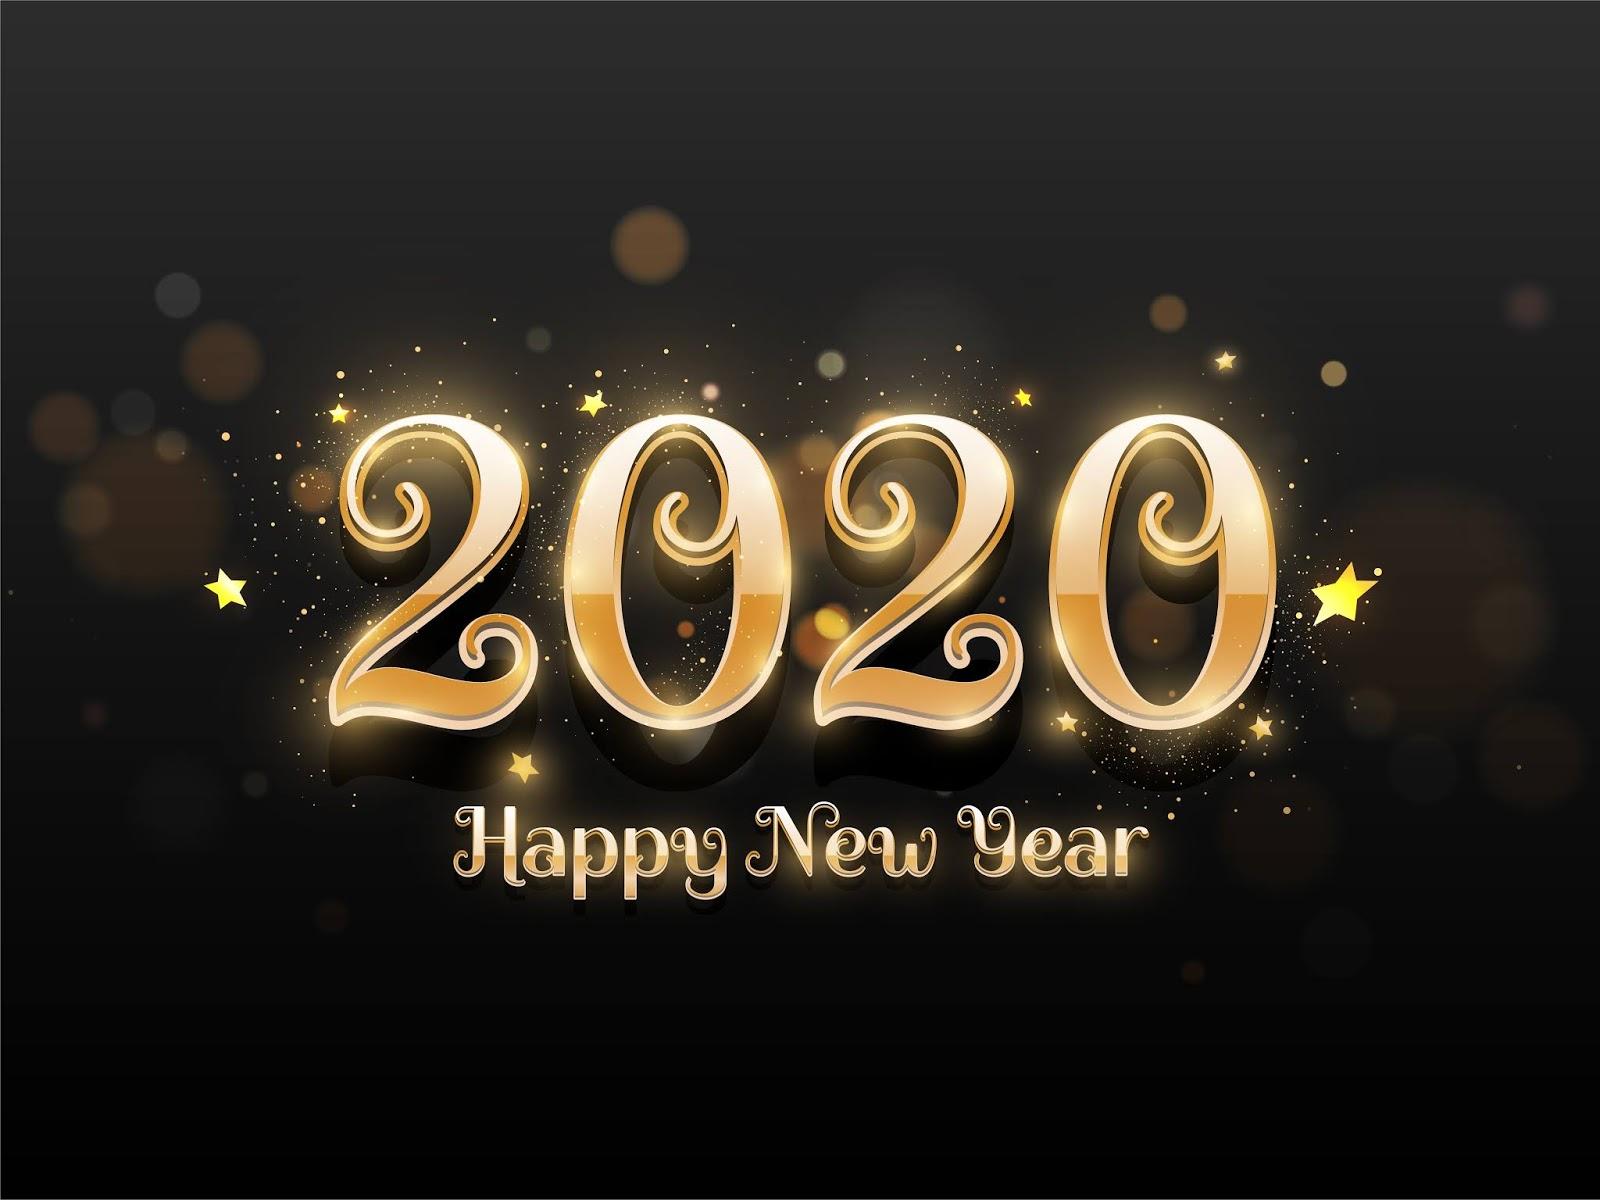 2020, Happy New Year, 4K, 5K, Celebrations,  New Year